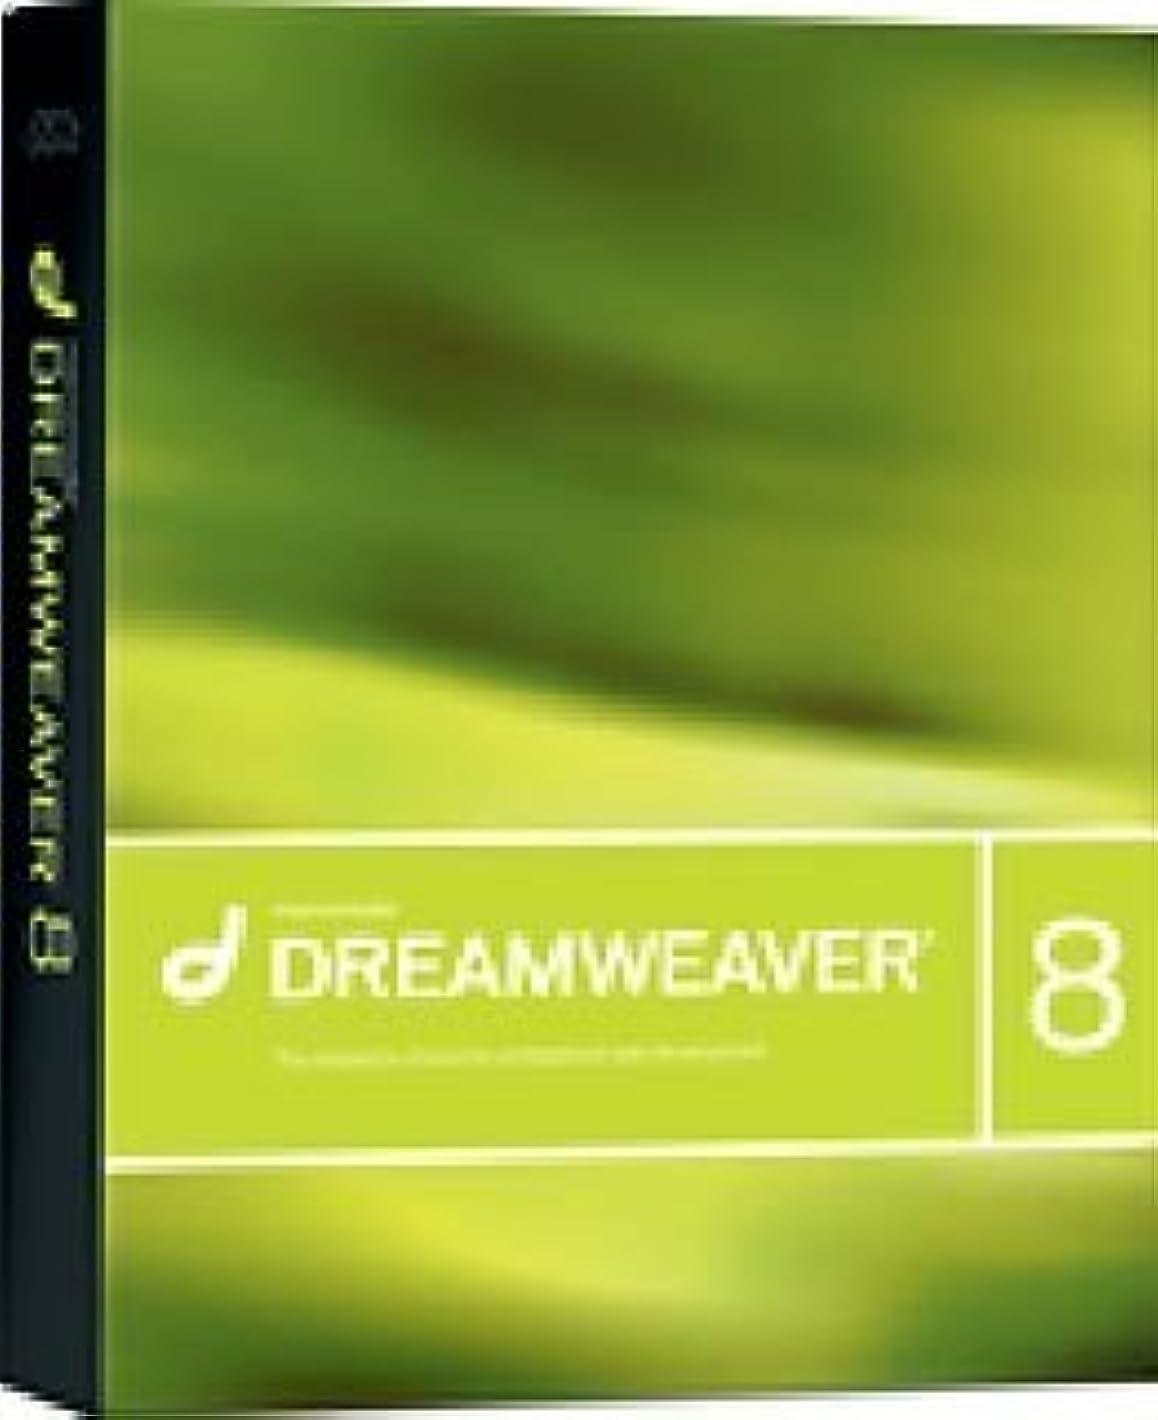 鋭く演劇乞食Dreamweaver 8 日本語版